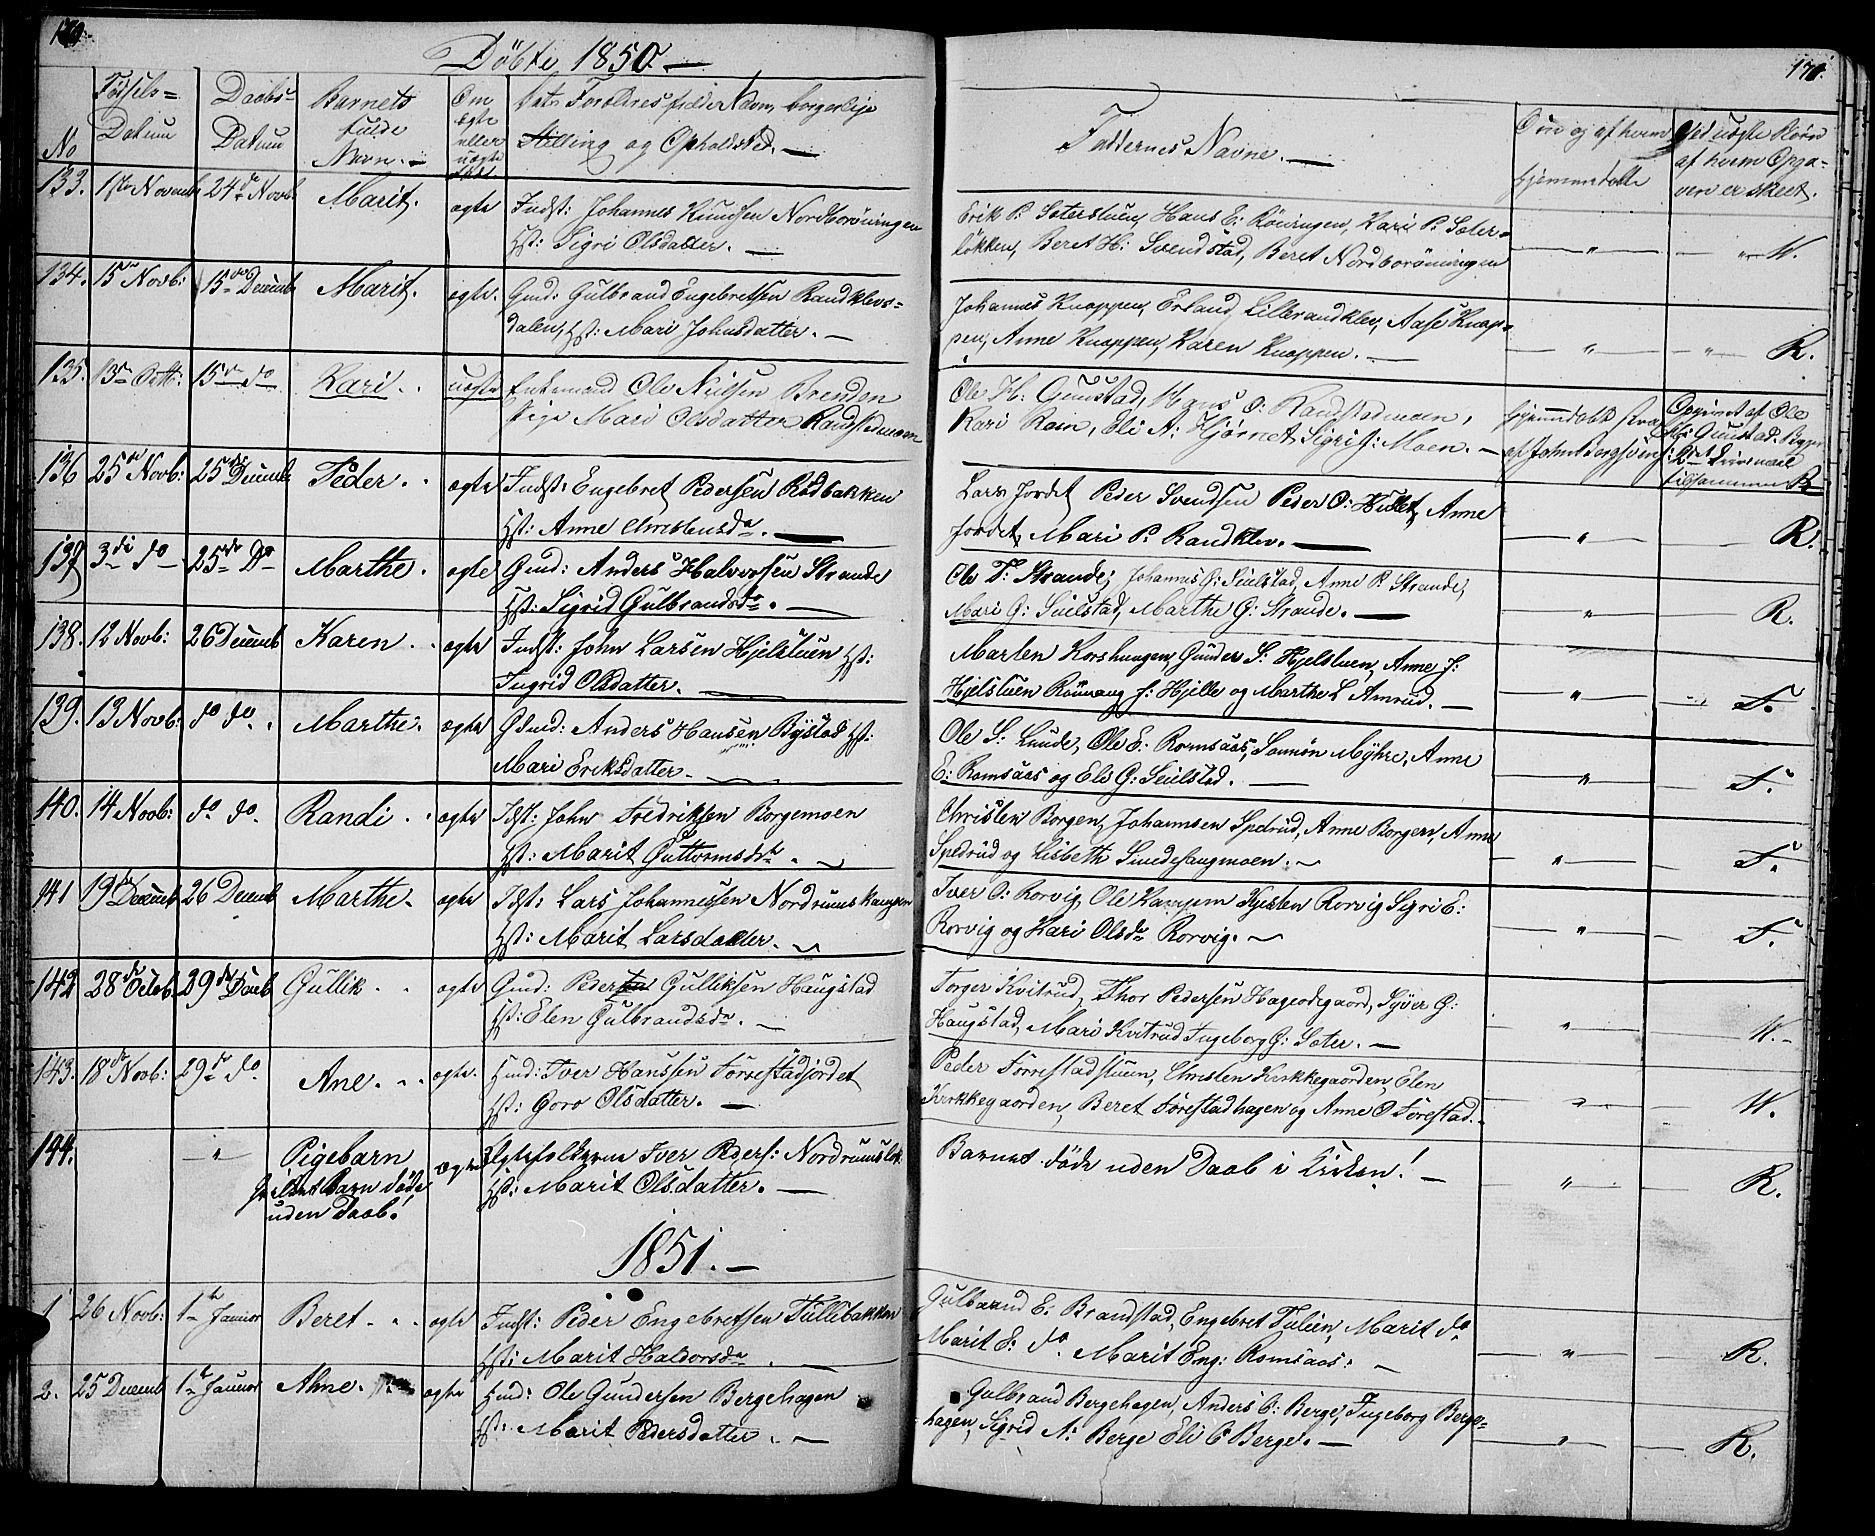 SAH, Ringebu prestekontor, Klokkerbok nr. 2, 1839-1853, s. 170-171